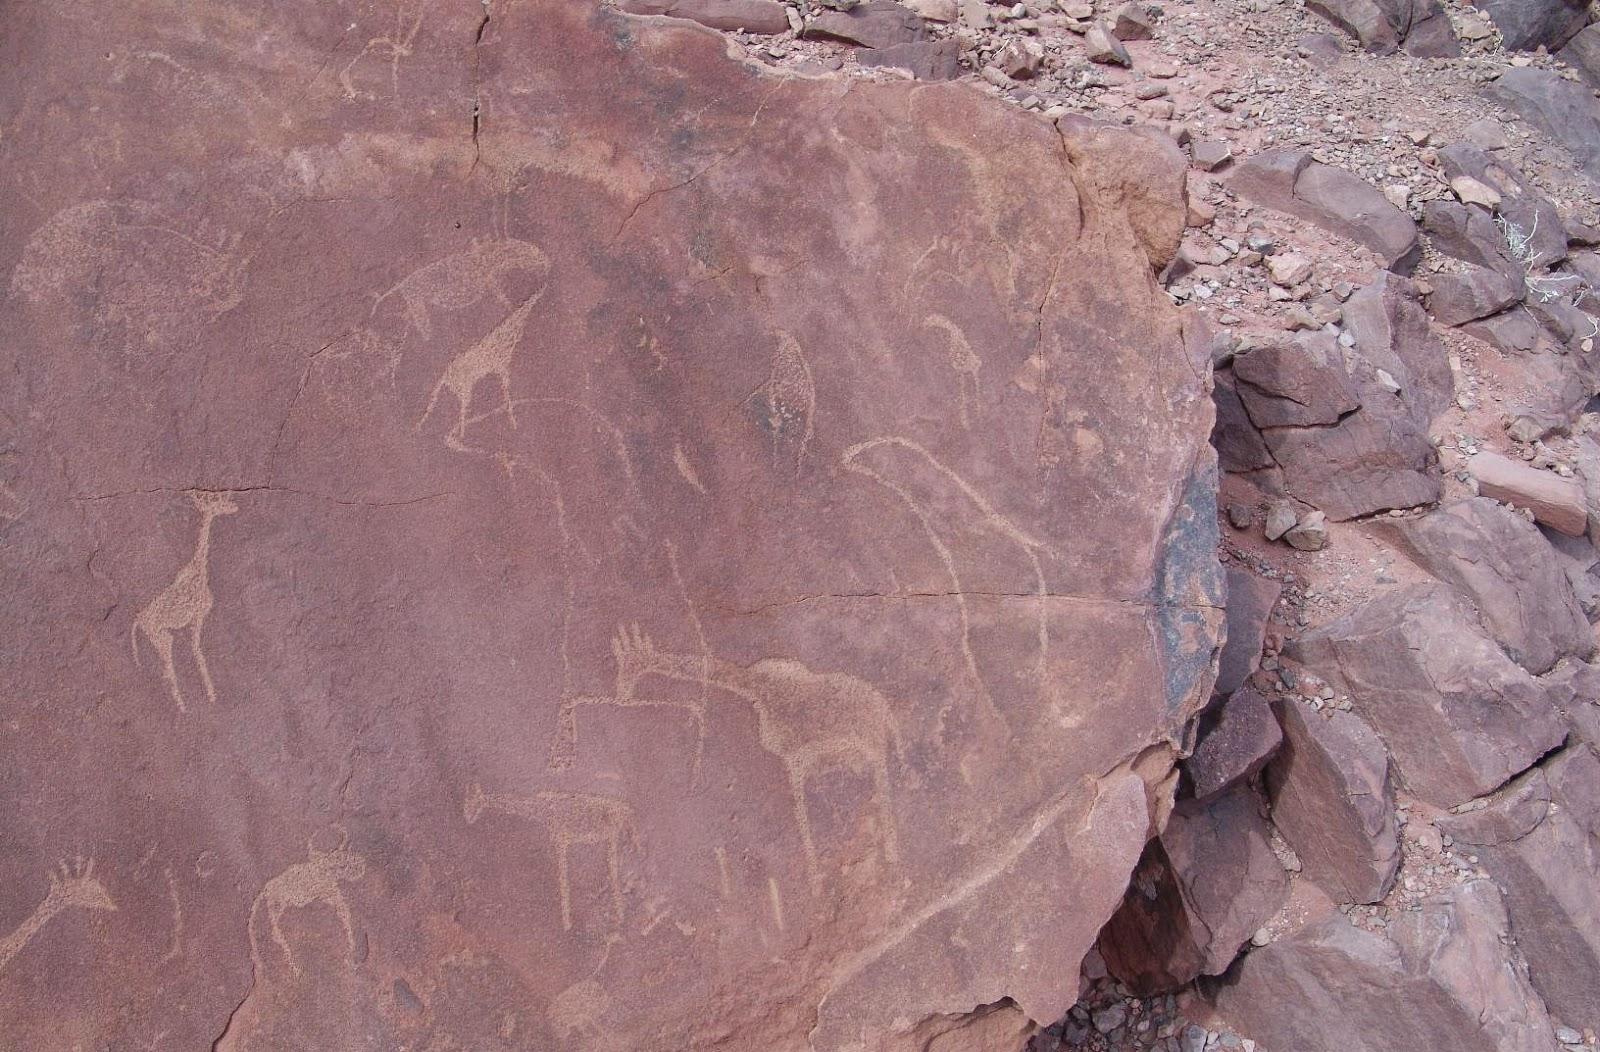 Twyfelfontein rock engravings Namibia - www.namibweb.com